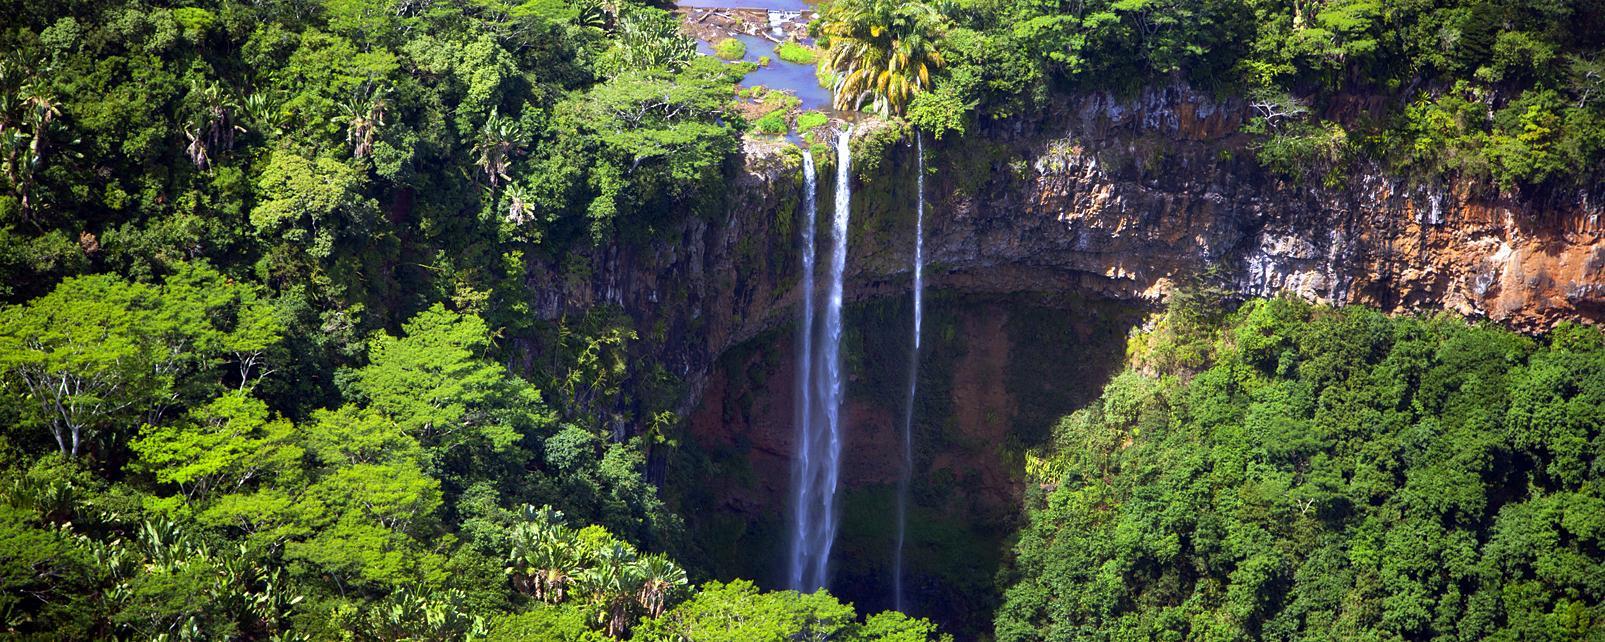 Océan Indien, Ile Maurice, Chamarel, cascade, nature,